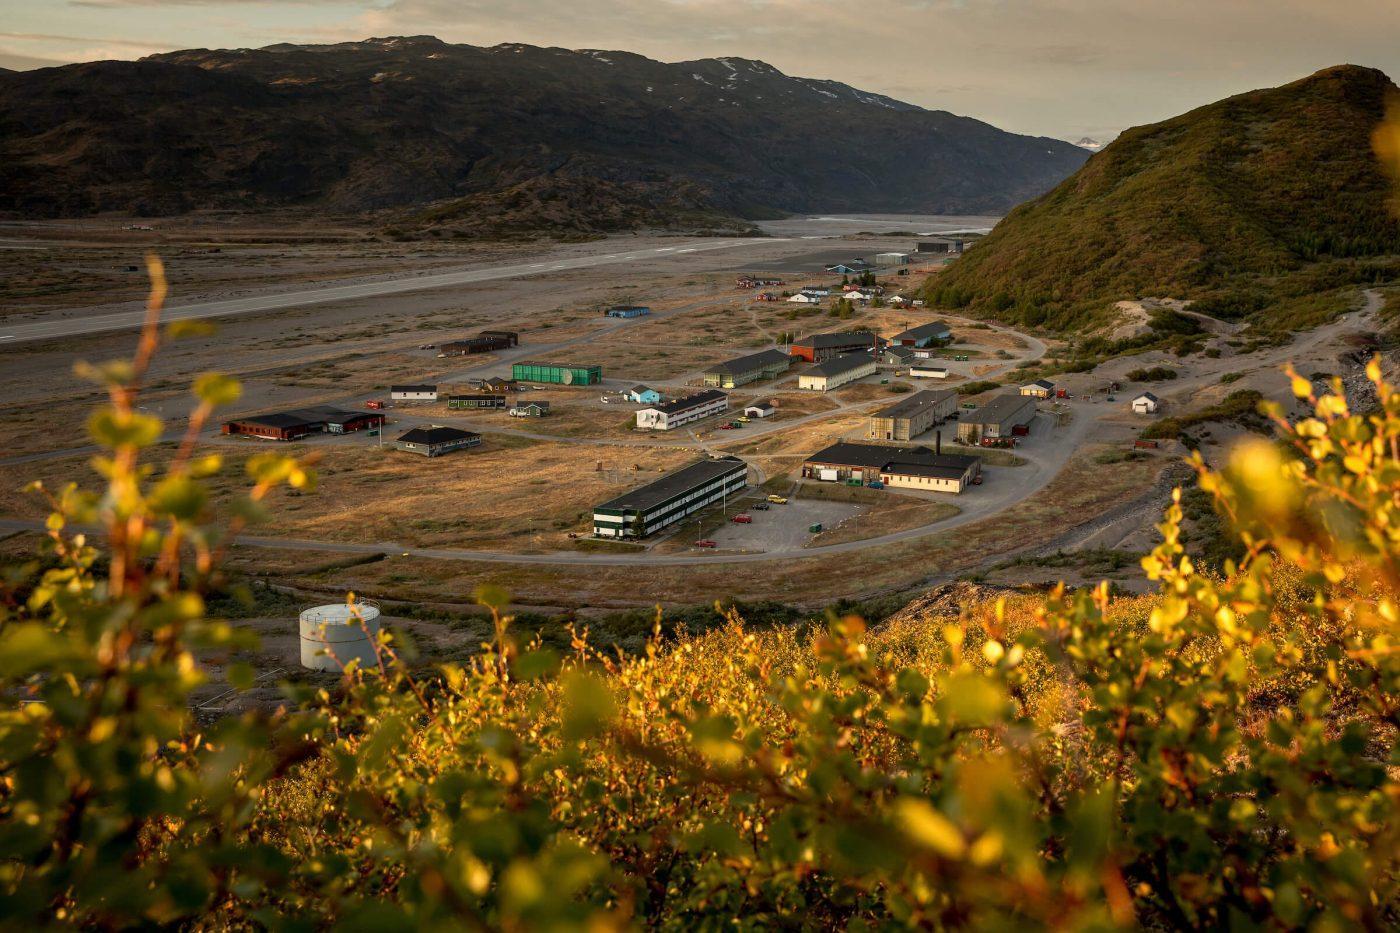 Narsarsuaq in South Greenland